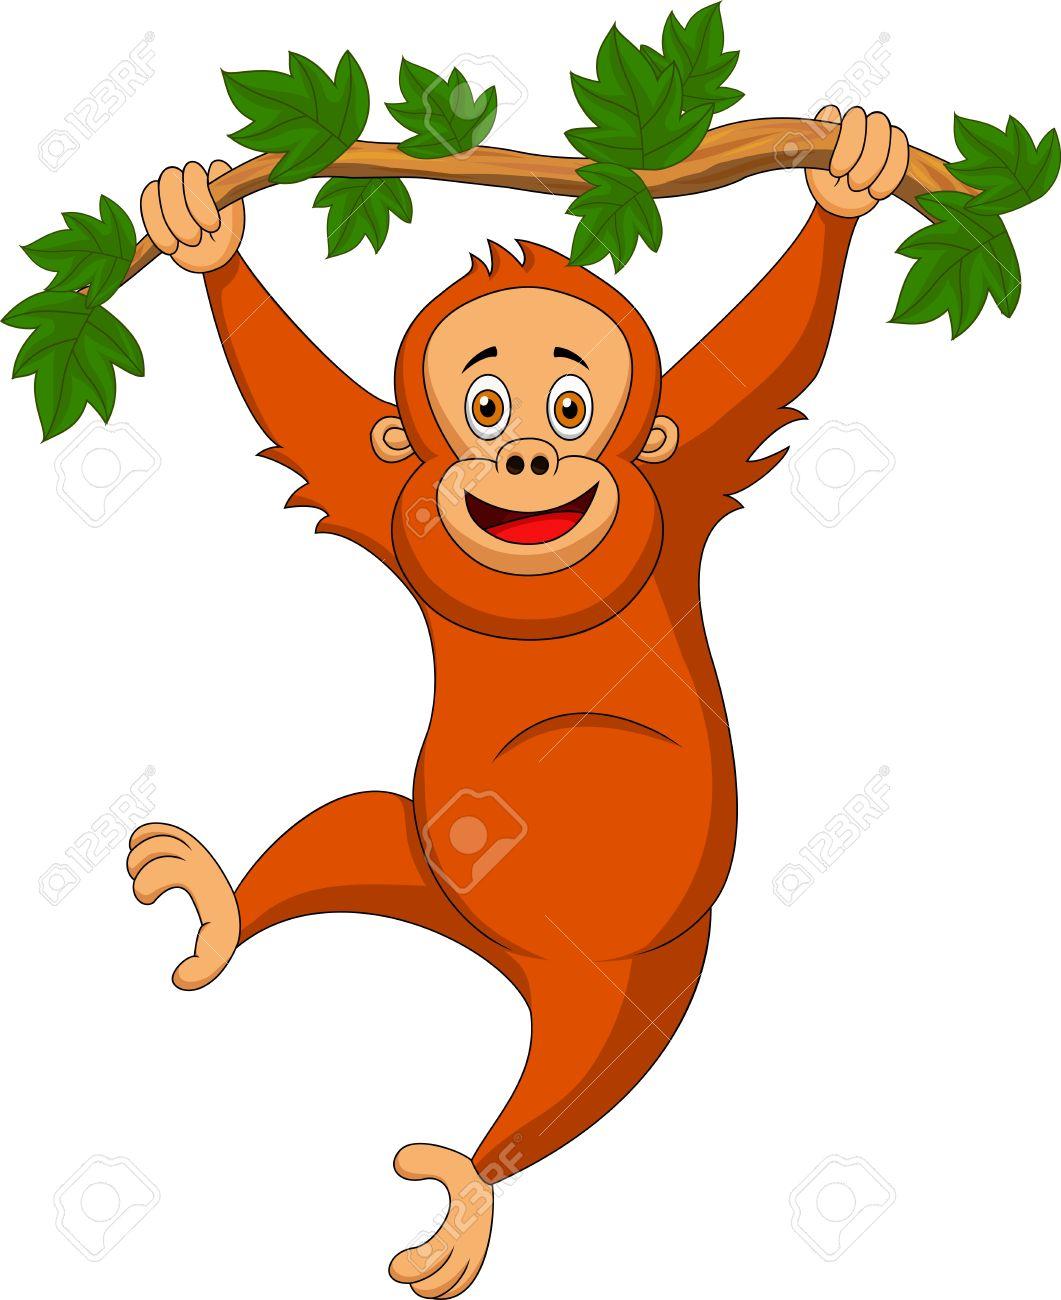 cute orangutan cartoon hanging on a tree branch royalty free